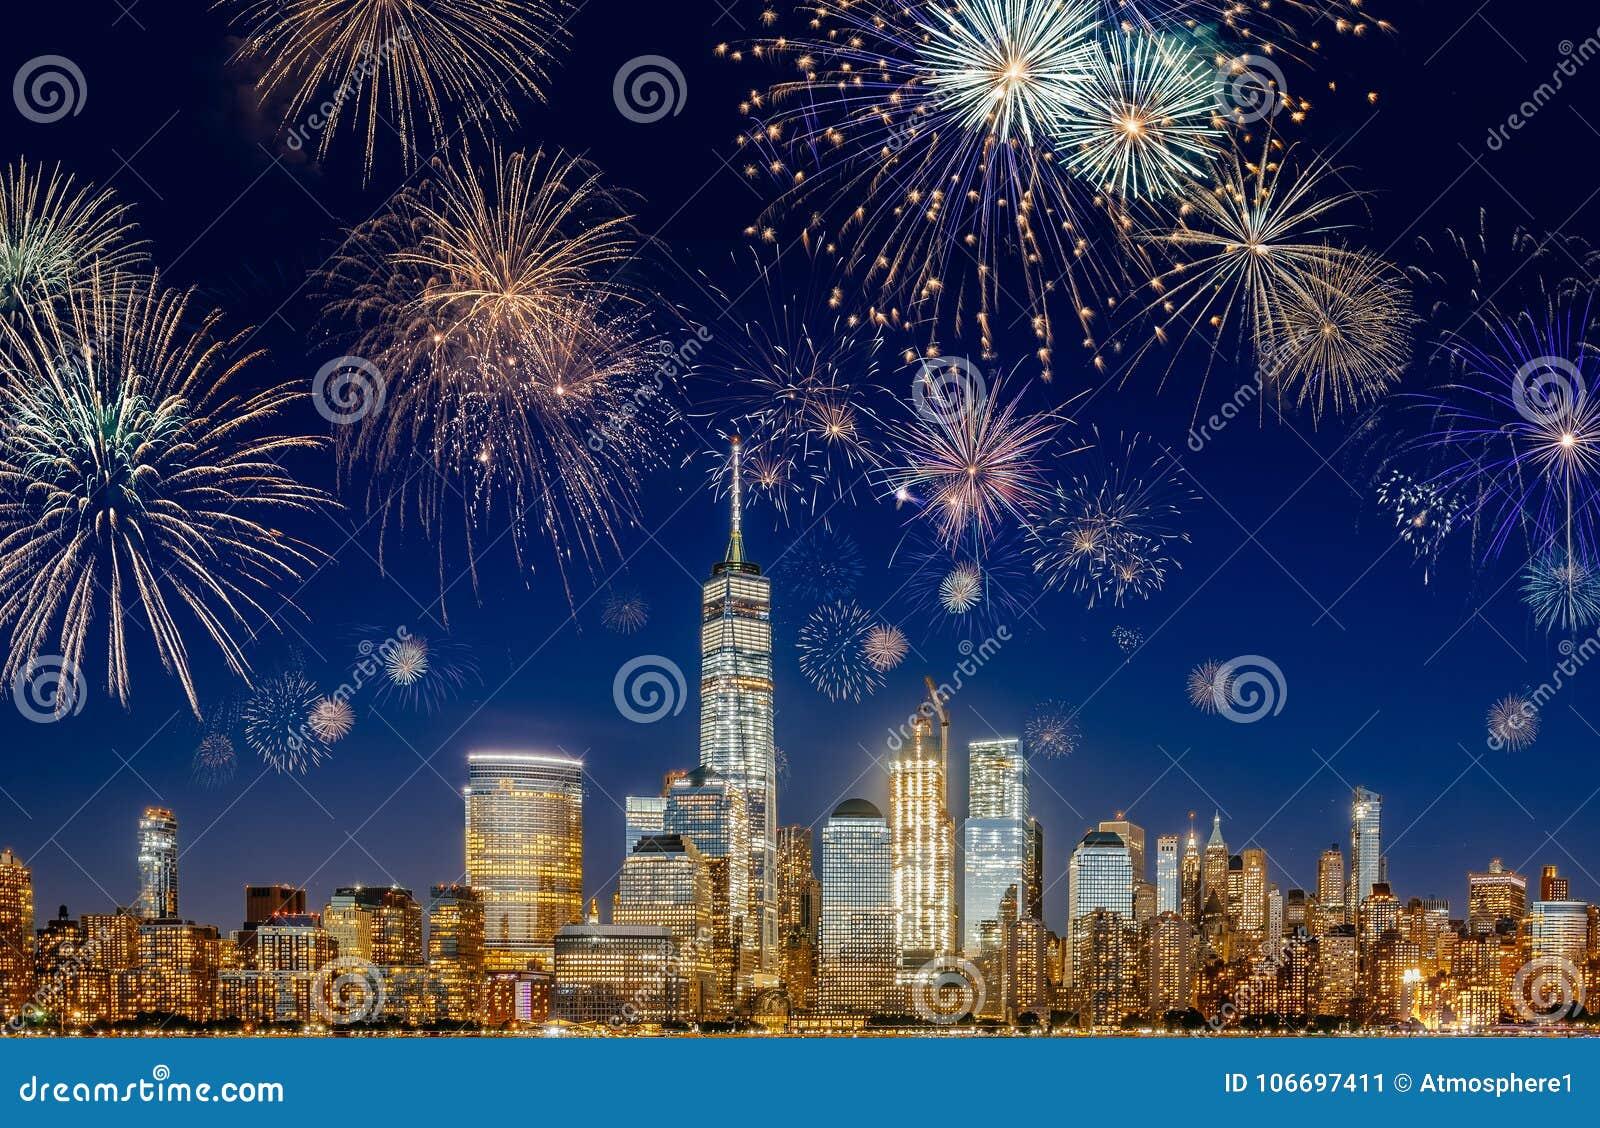 New York City Skyline with Flashing Fireworks - long exposure